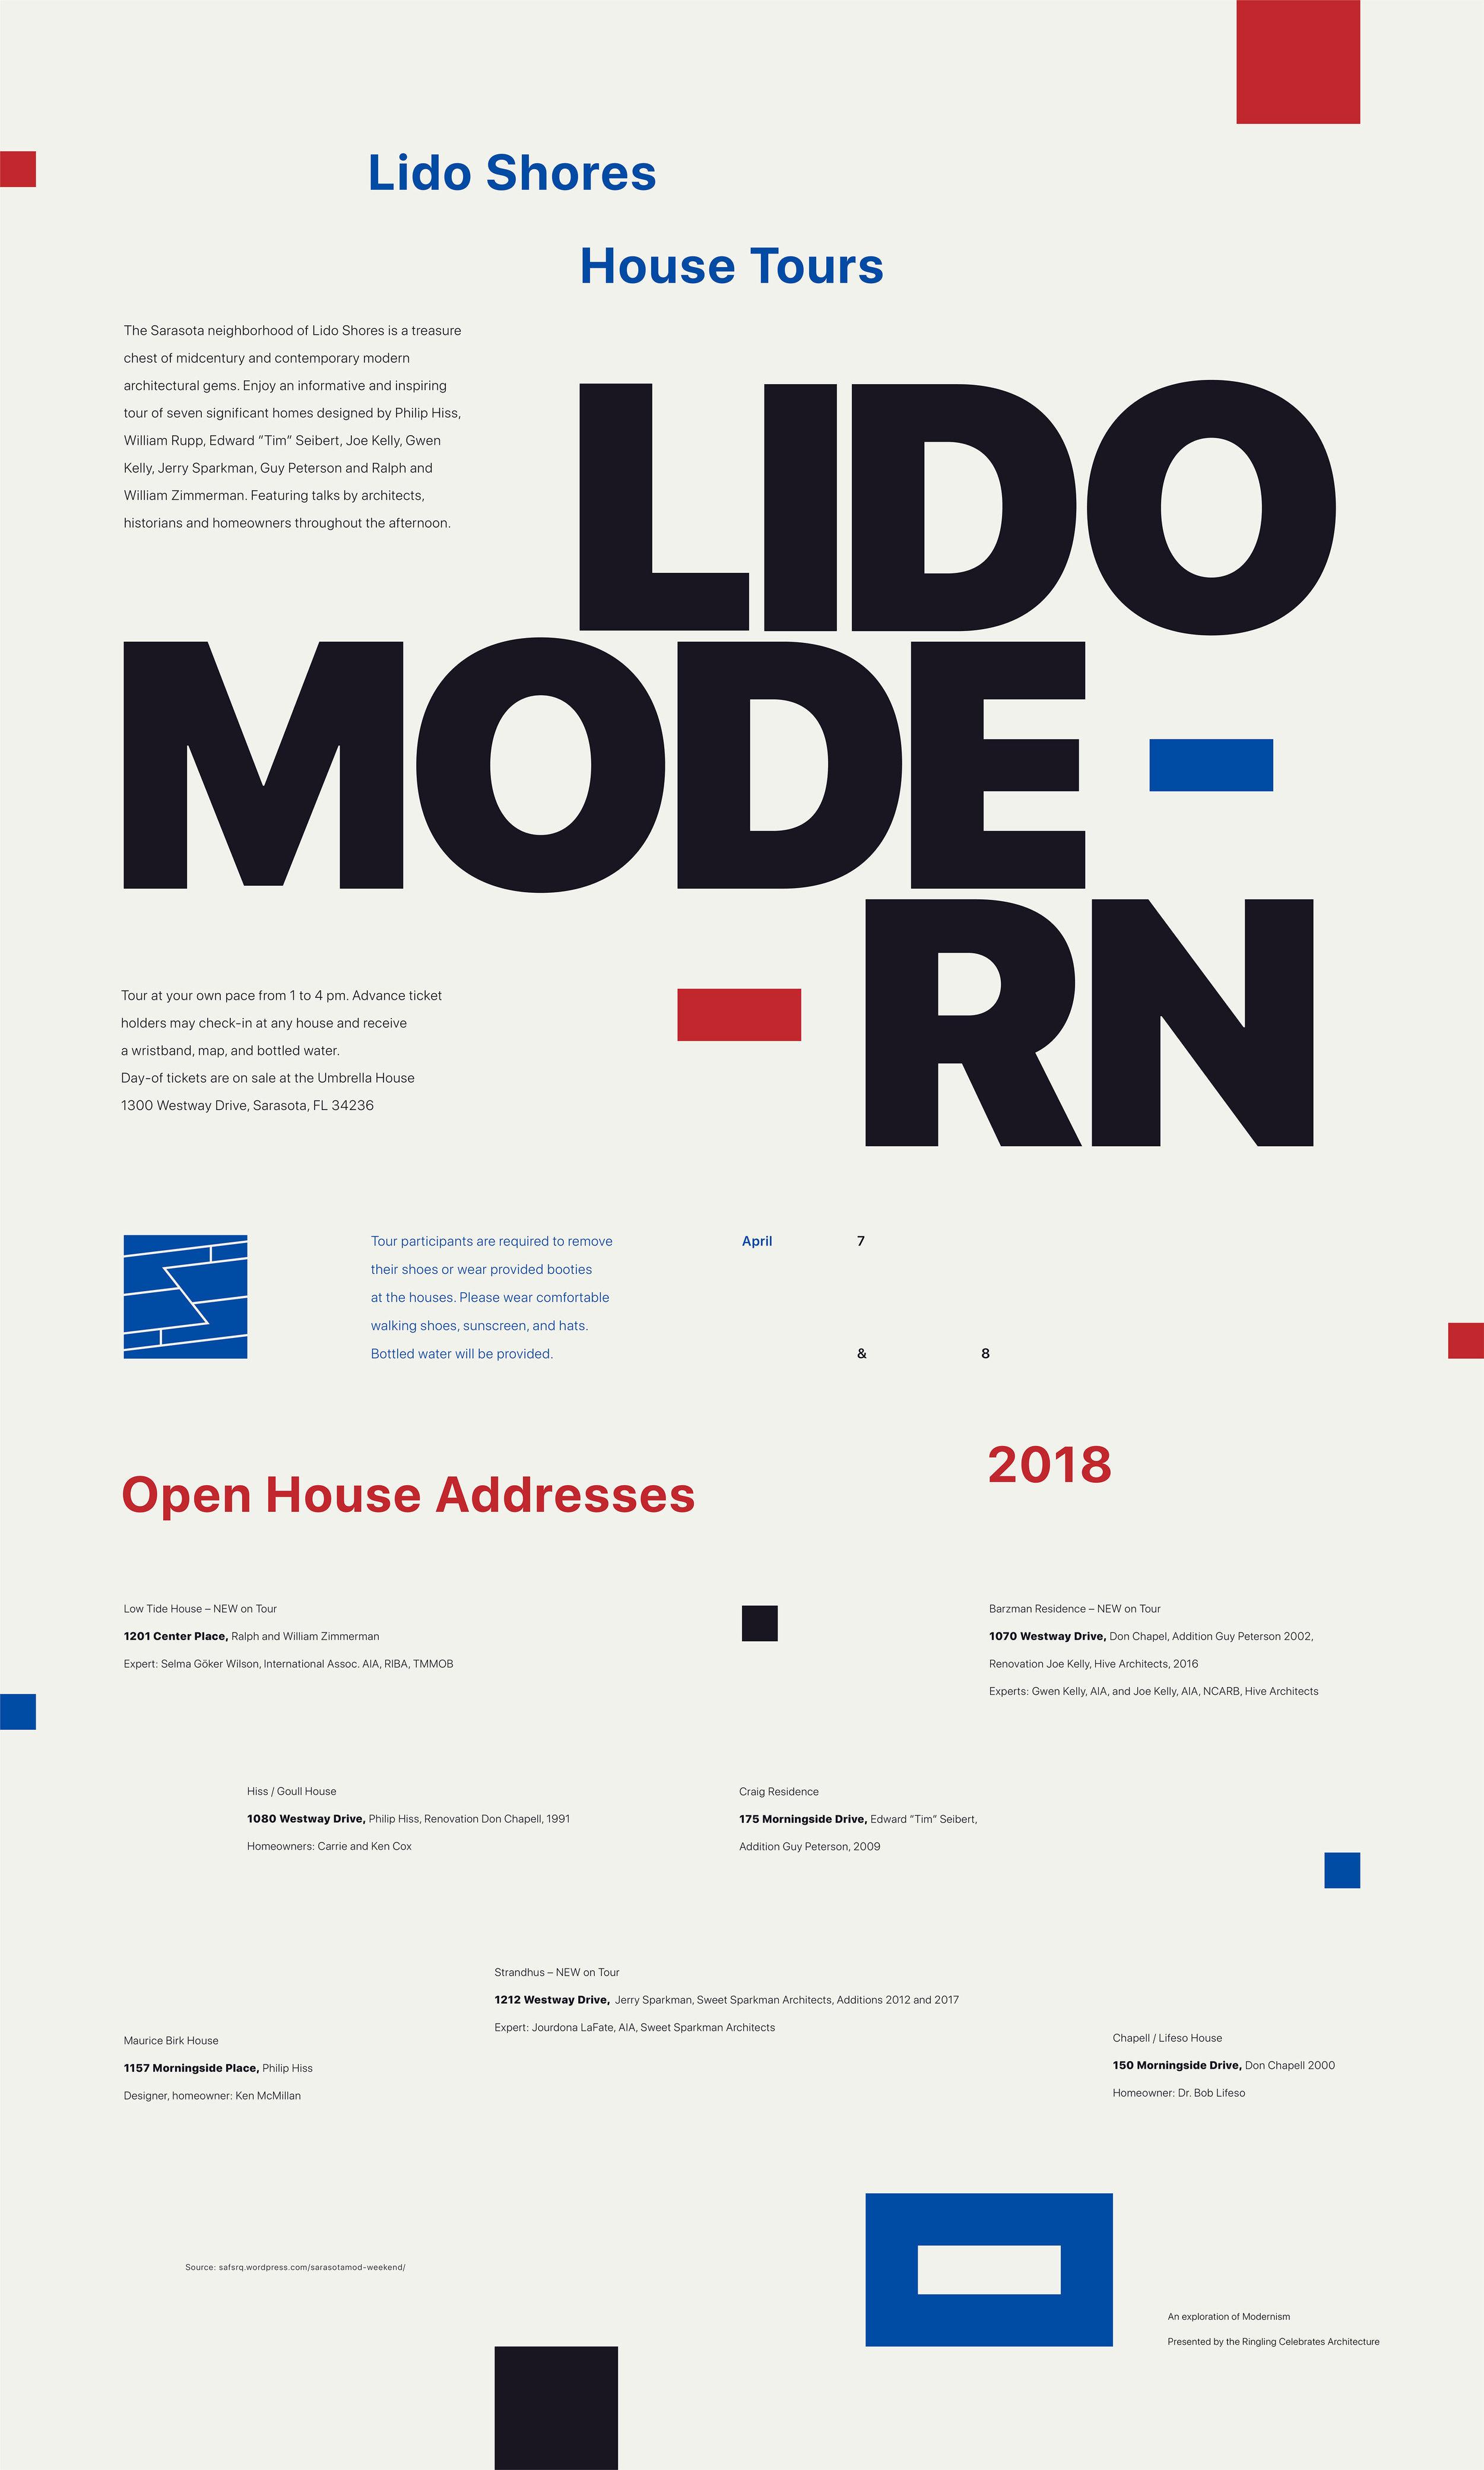 LidoModern.jpg